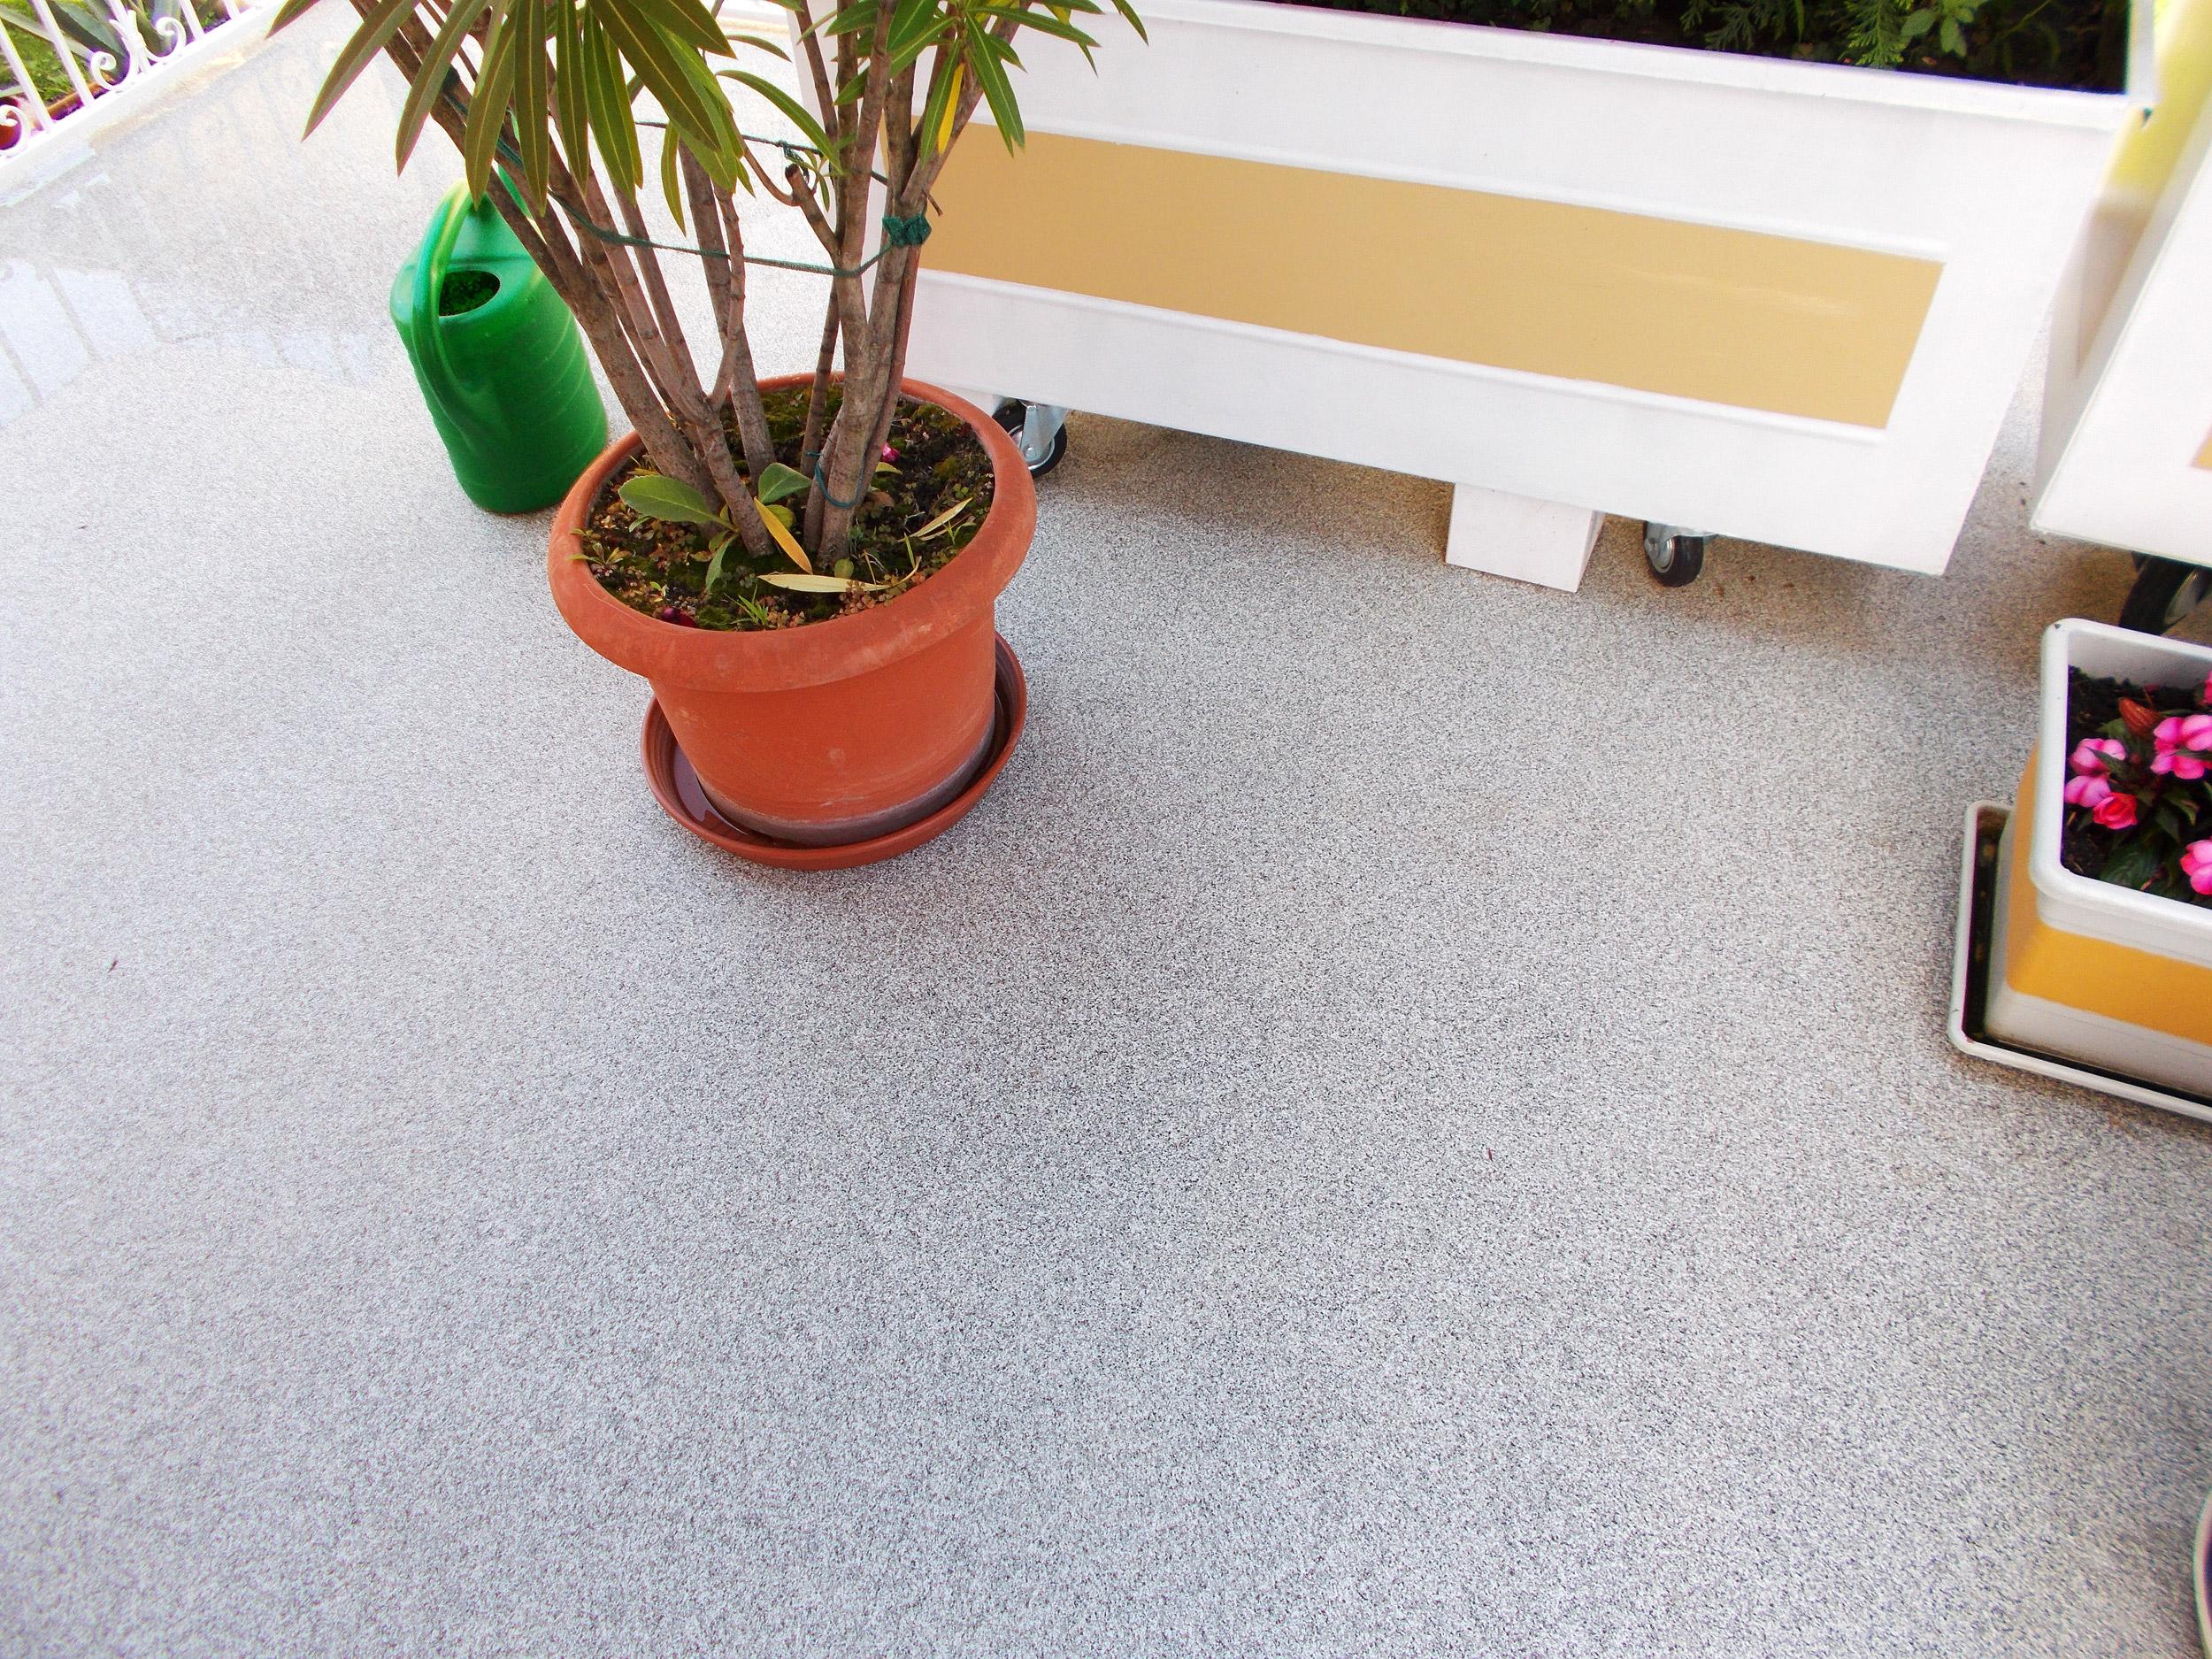 Berühmt Balkon und Terrassenbeschichtung | Bautenschutz Melcher EF41